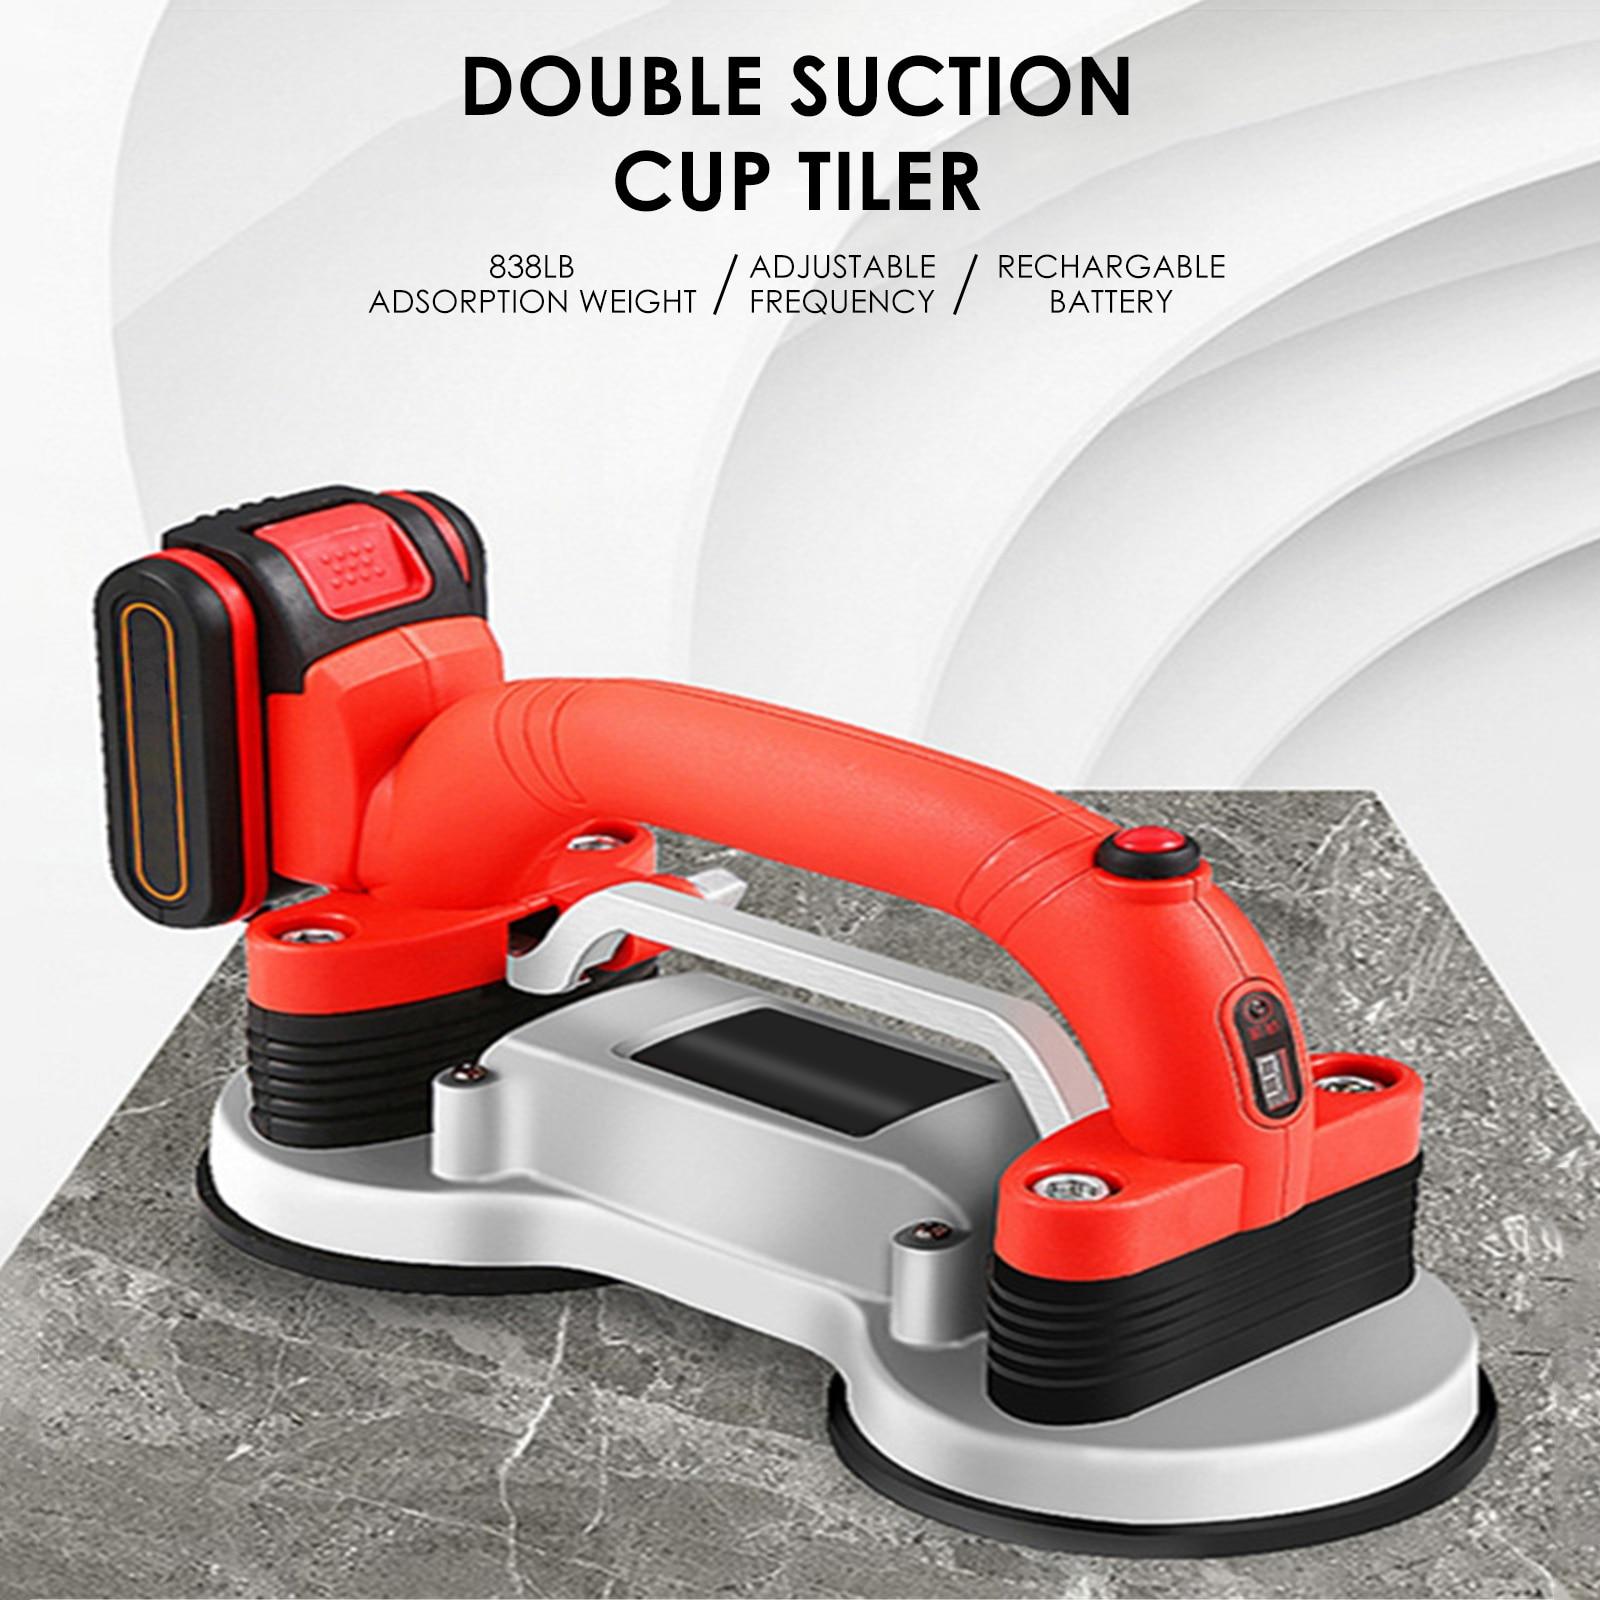 21V Professional Double Suction Cup Tiler Machine for Kitchen Living Room Shower Base Wall Tiles Vibrator Tile Leveling Device